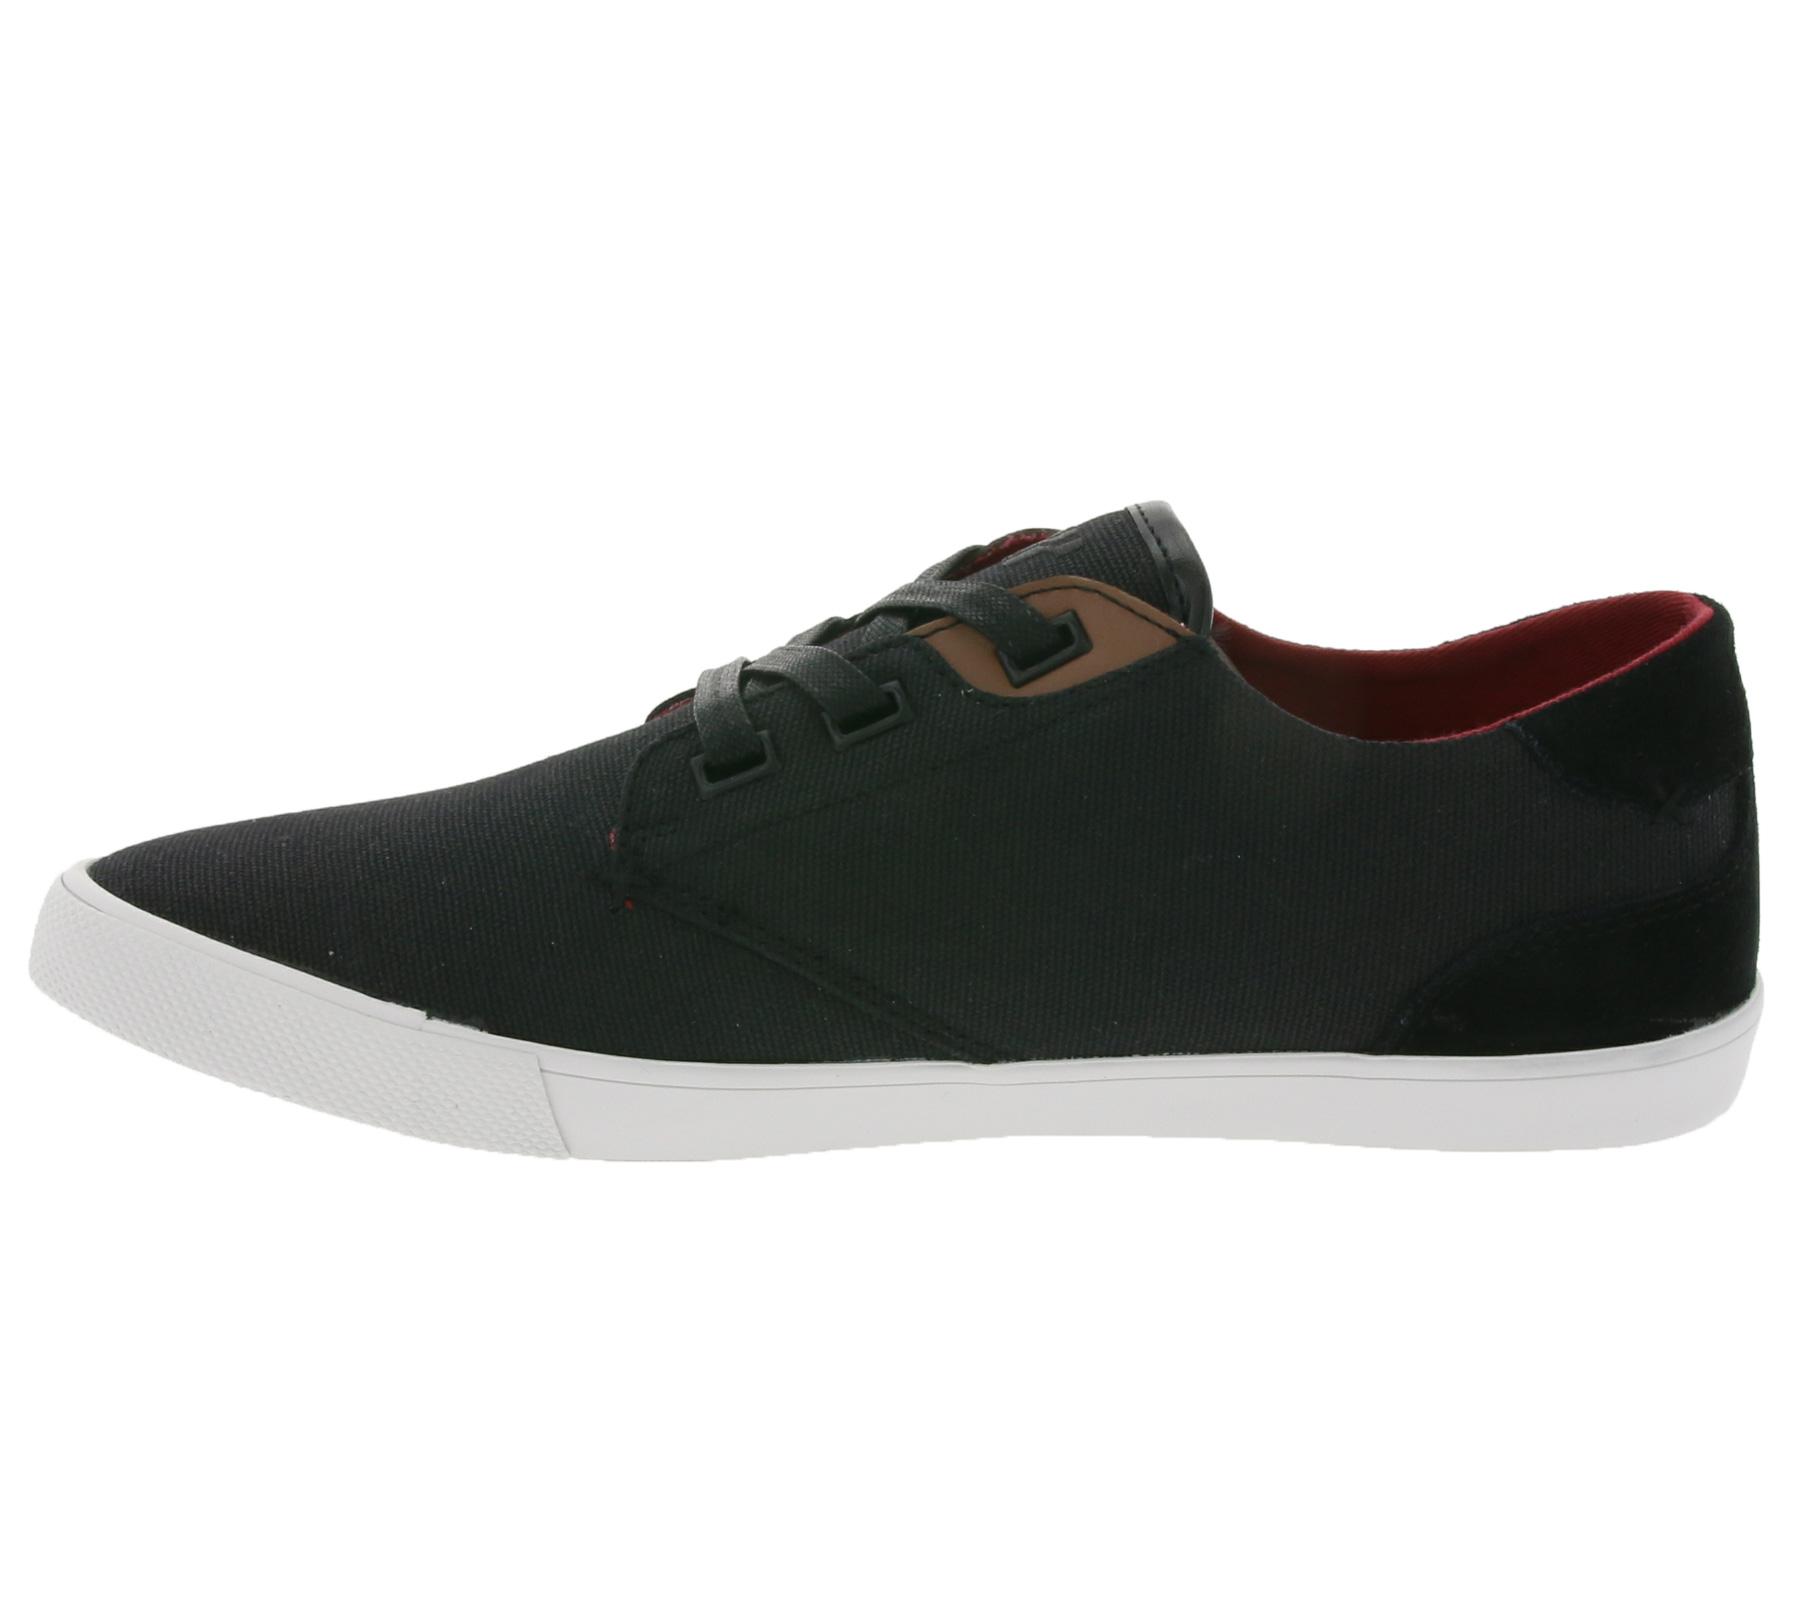 Boxfresh Schuhe Stern Sneaker Herren Low Cut Turnschuhe